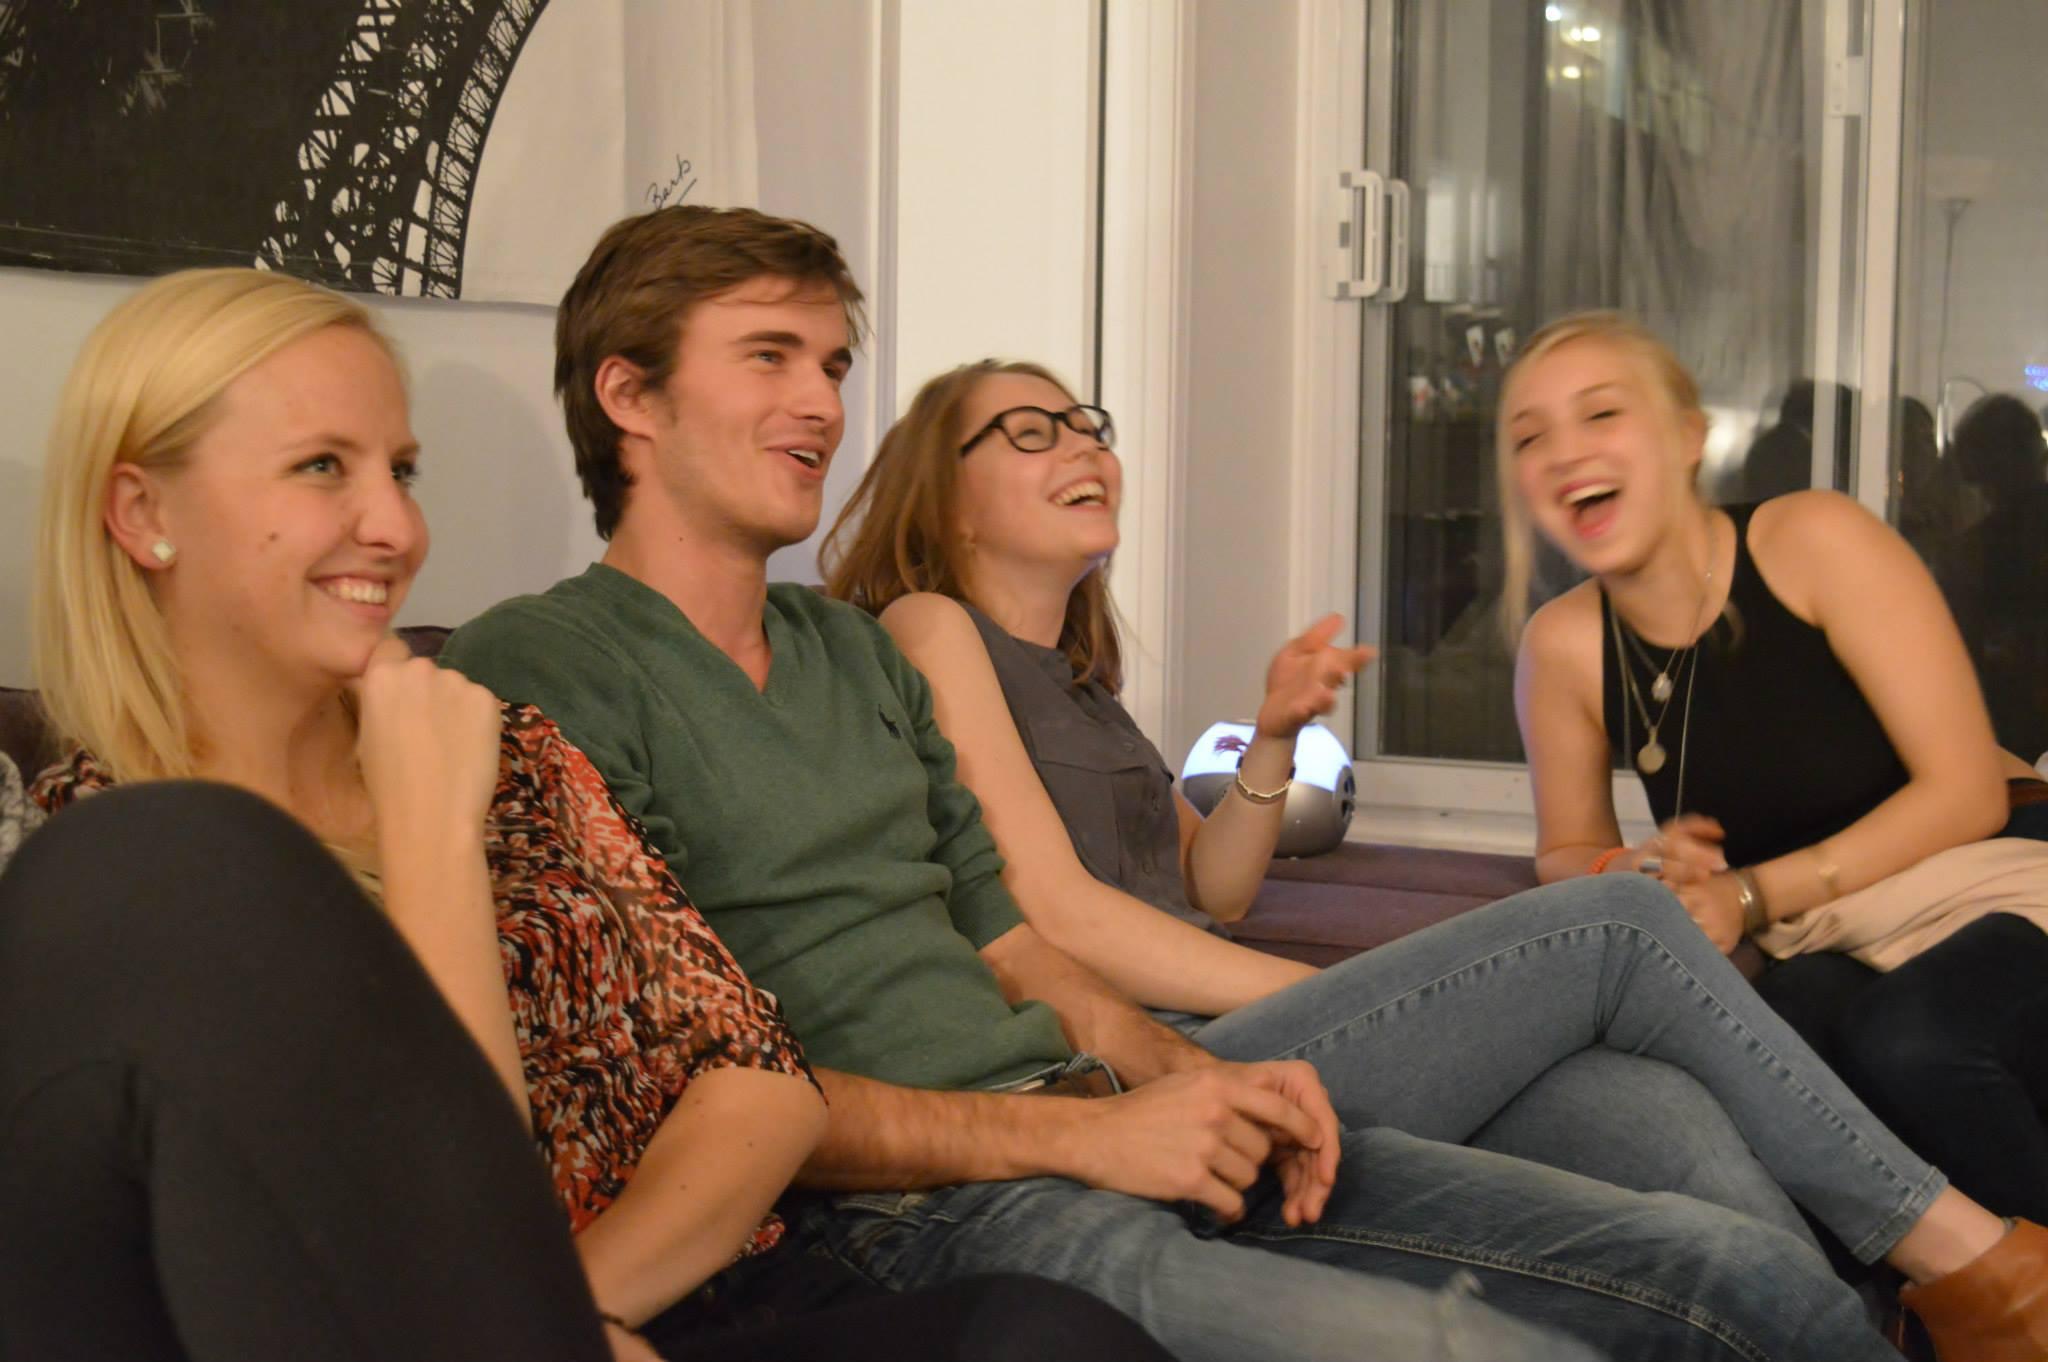 Building lasting friendships with fellow entrepreneurs